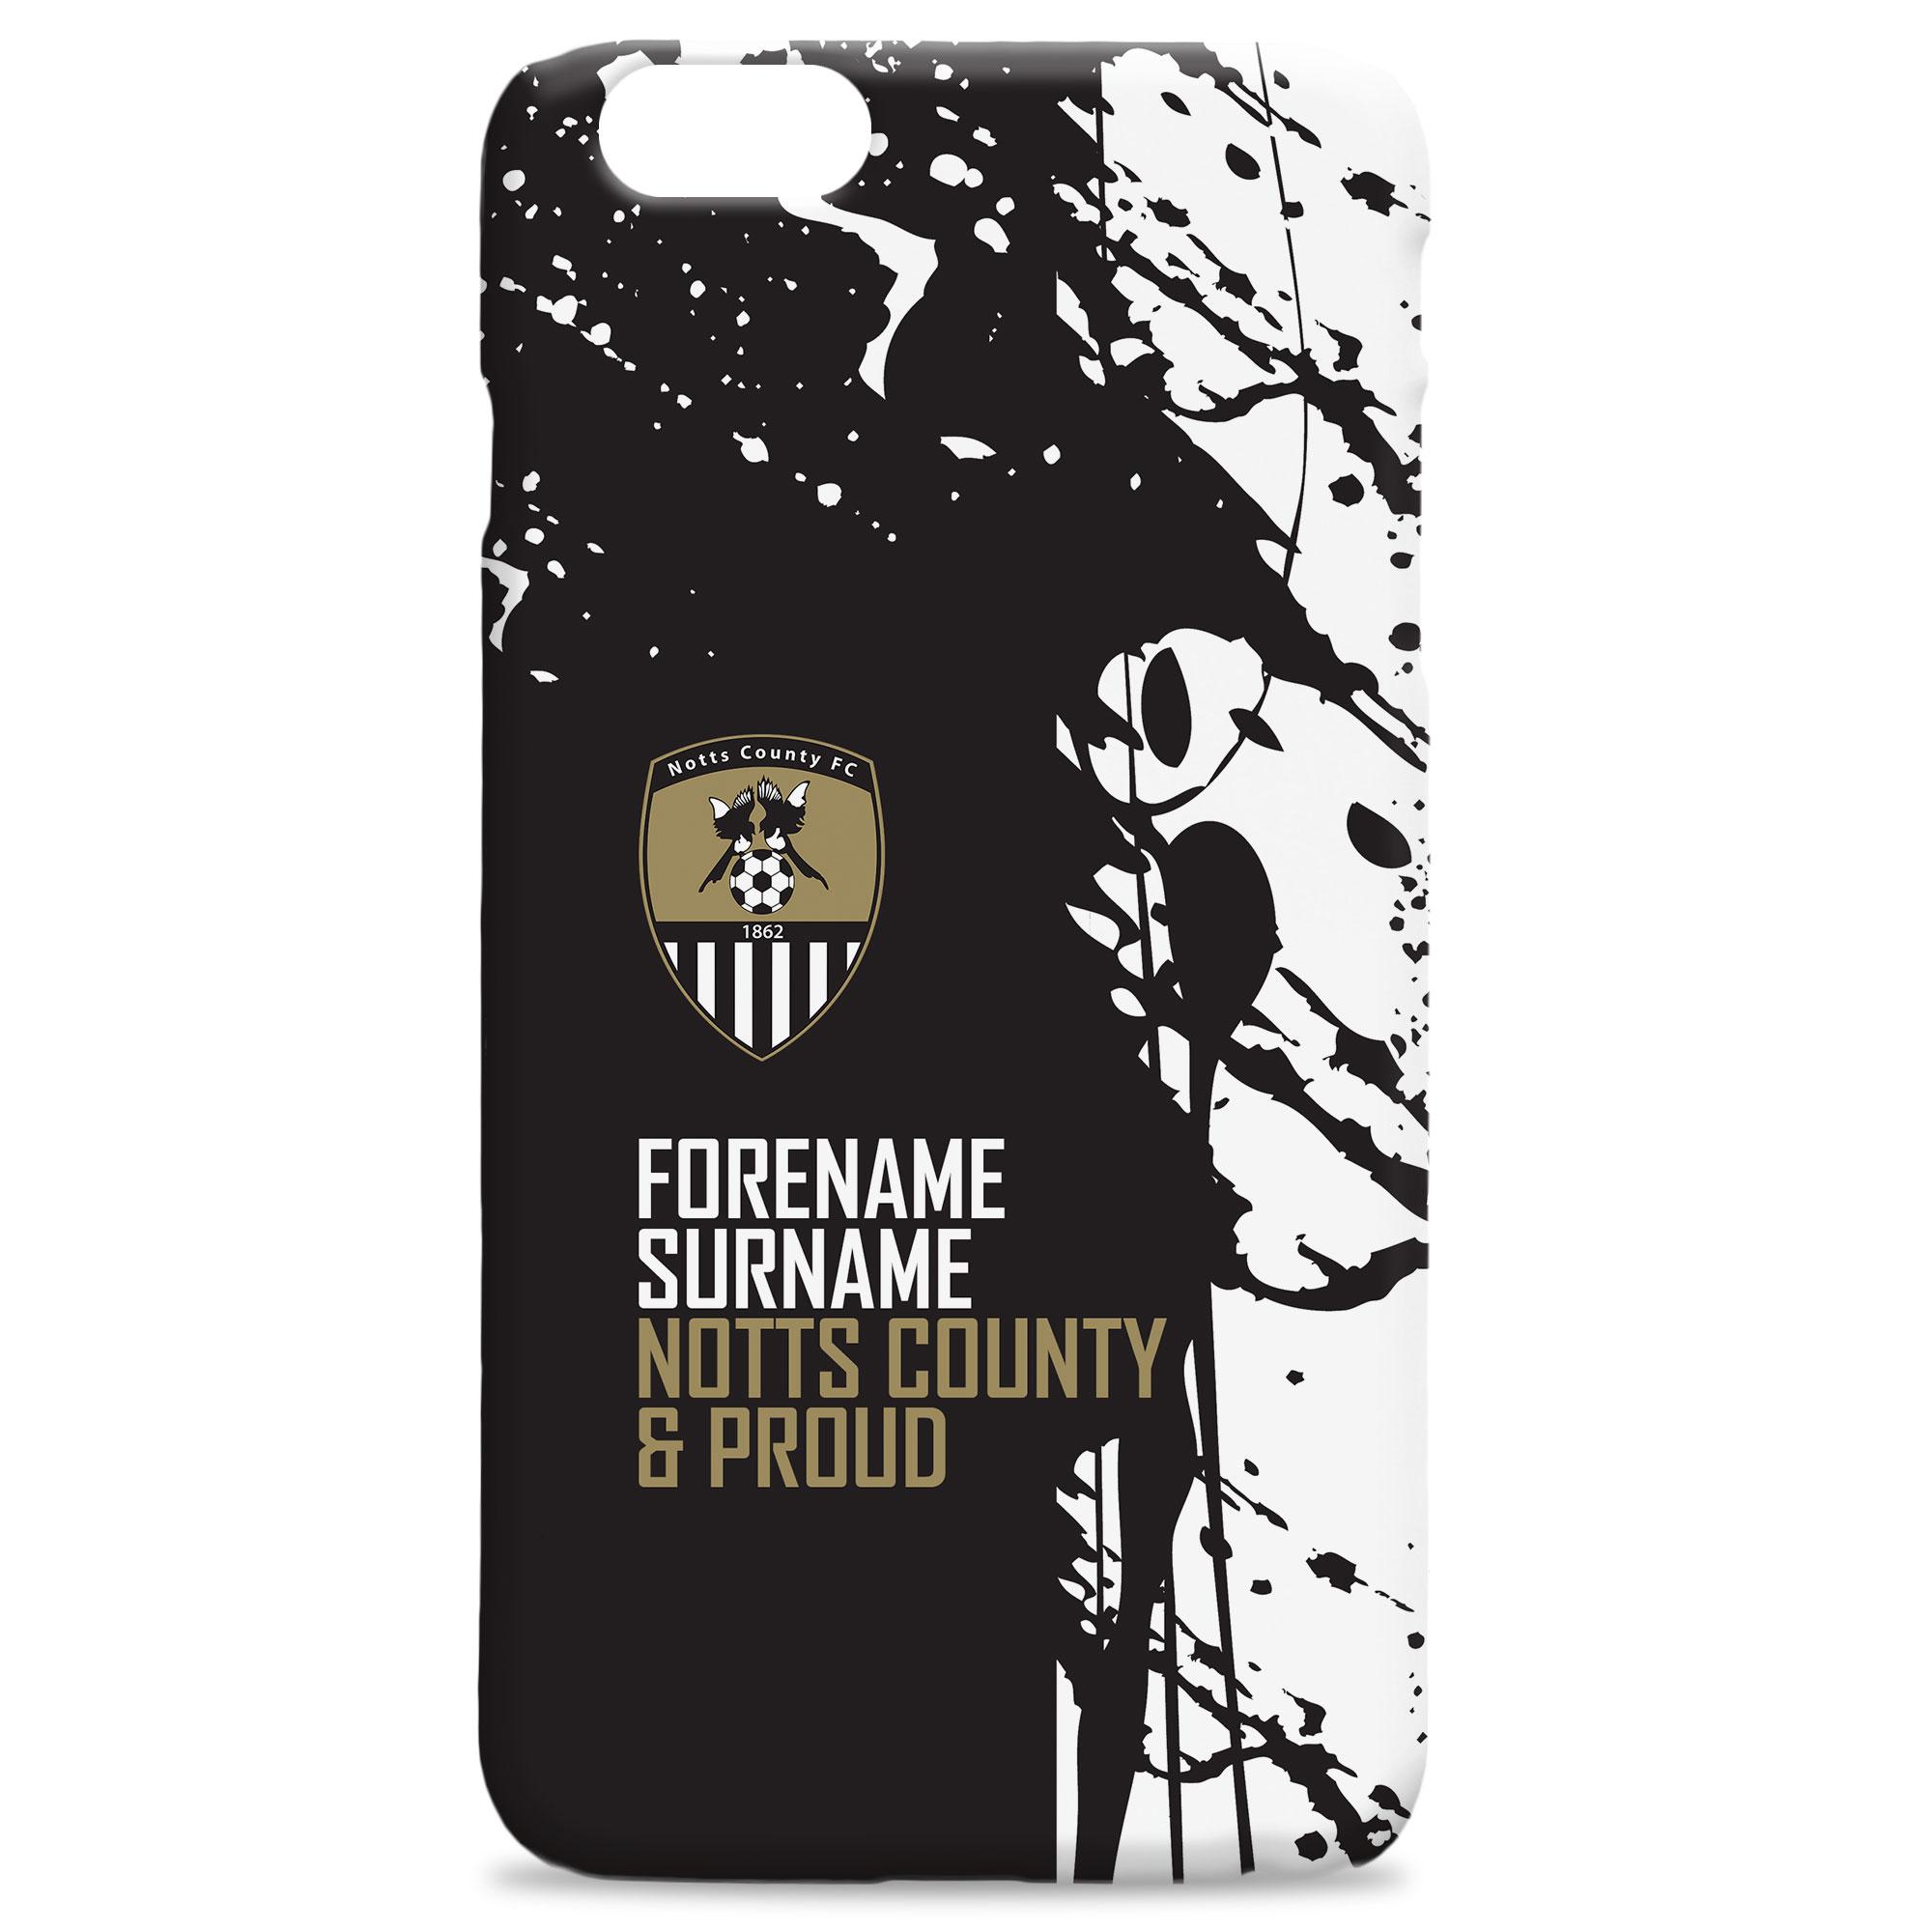 Notts County FC Proud Hard Back Phone Case